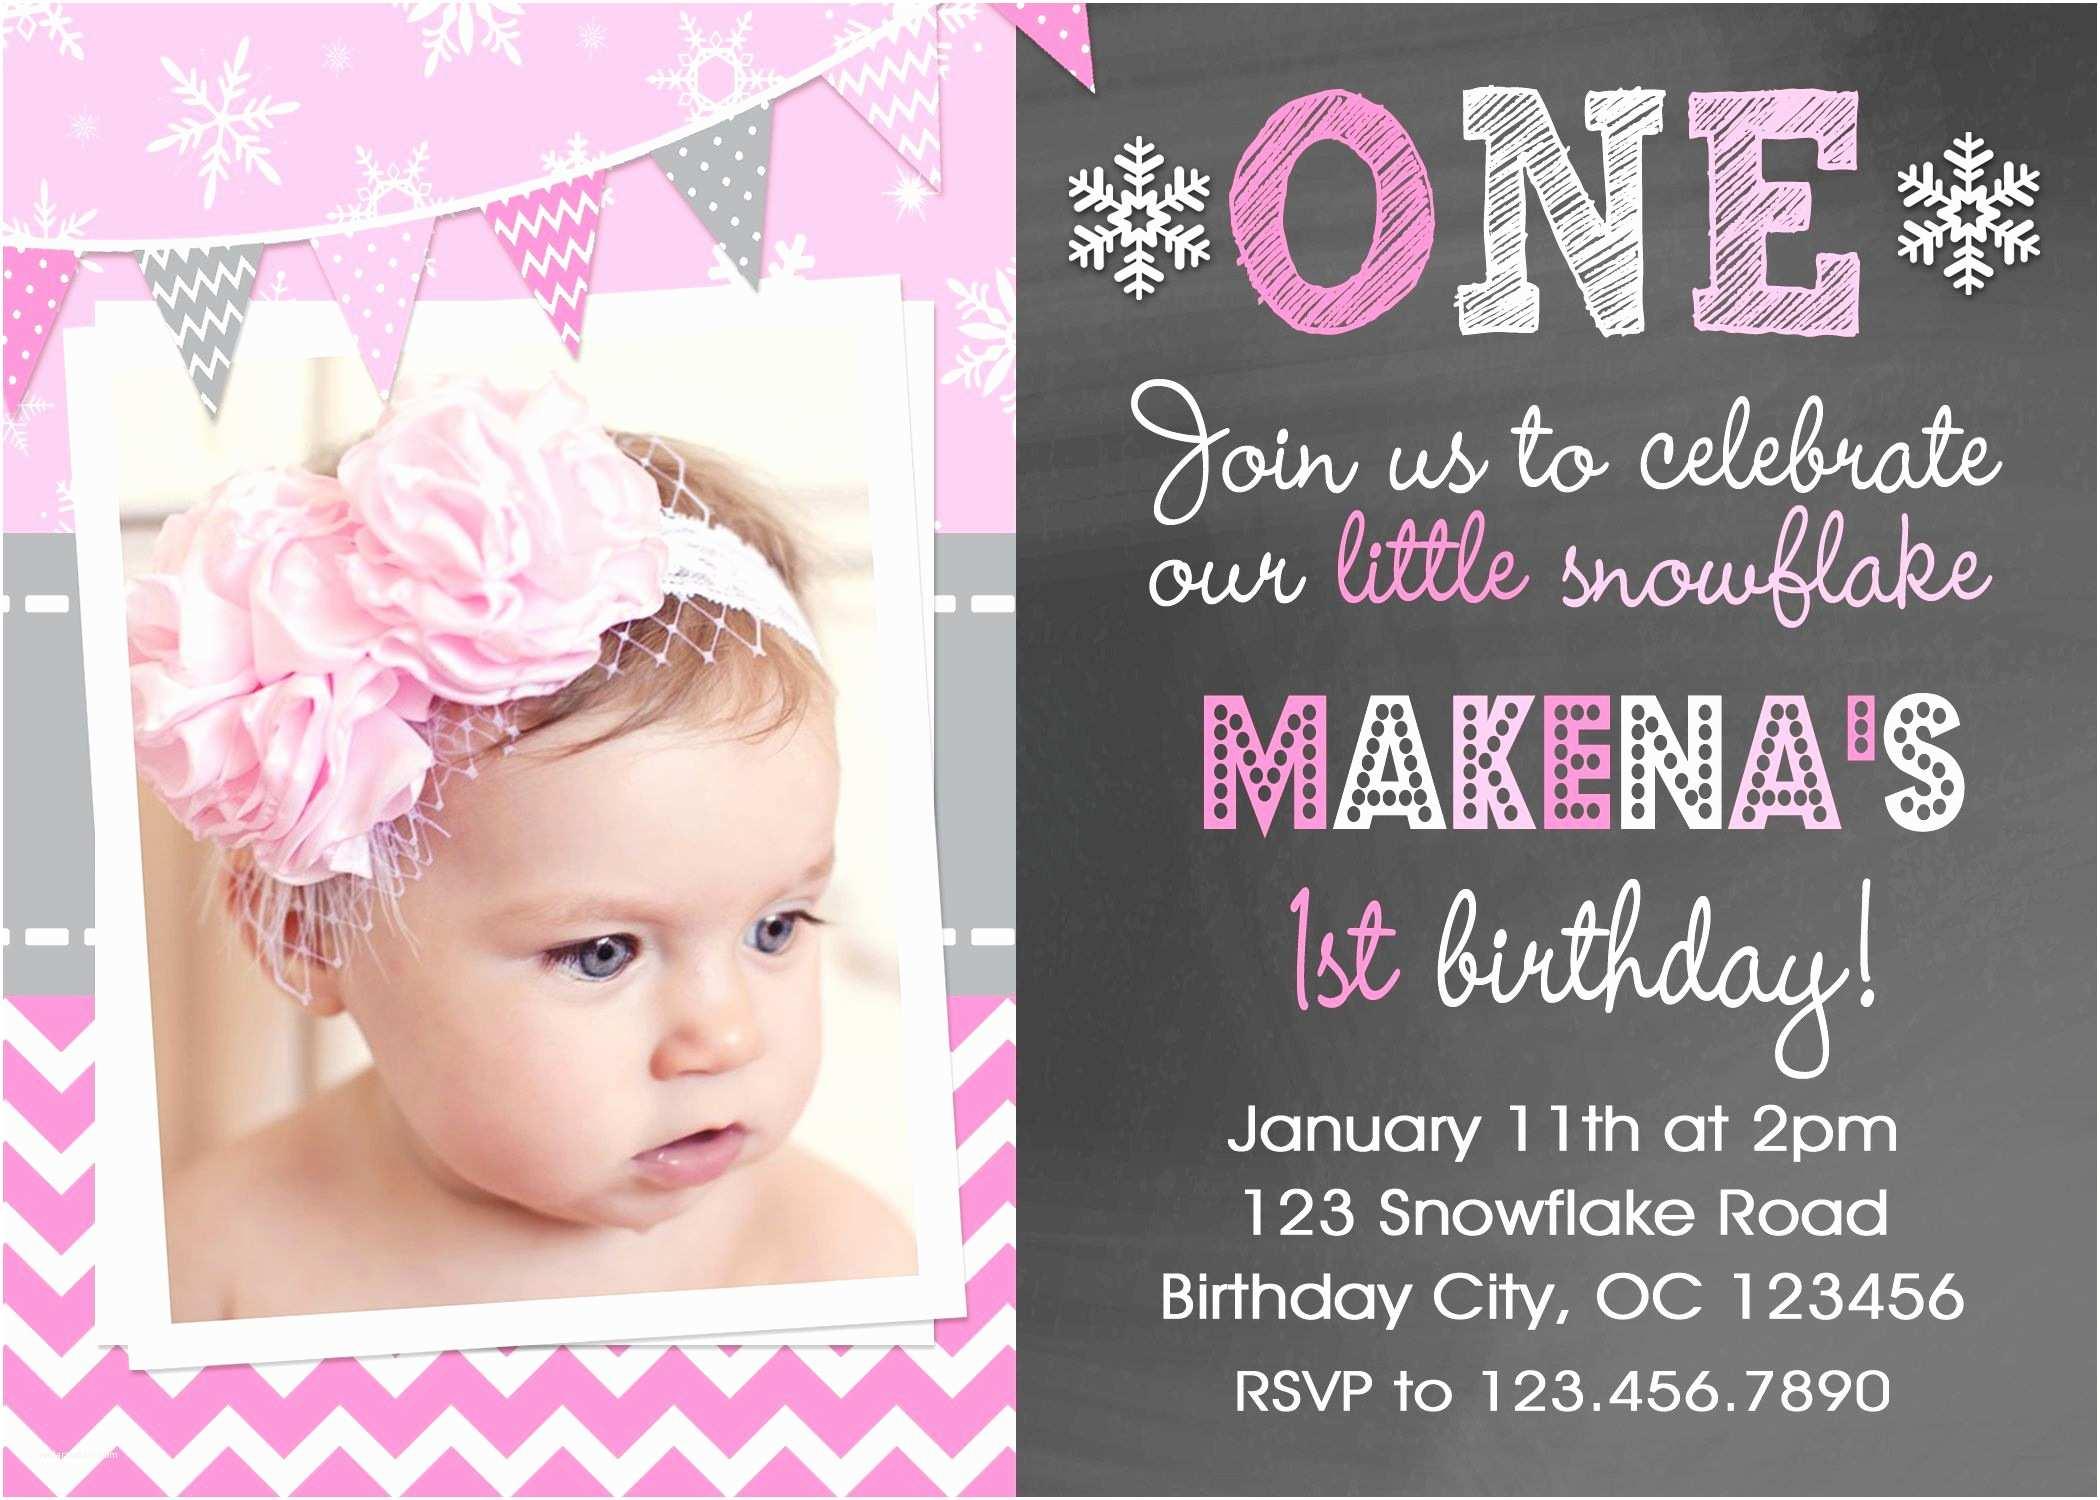 1st Birthday Invitations Girl 1st Birthday Invitation Card Matter Unique Birthday